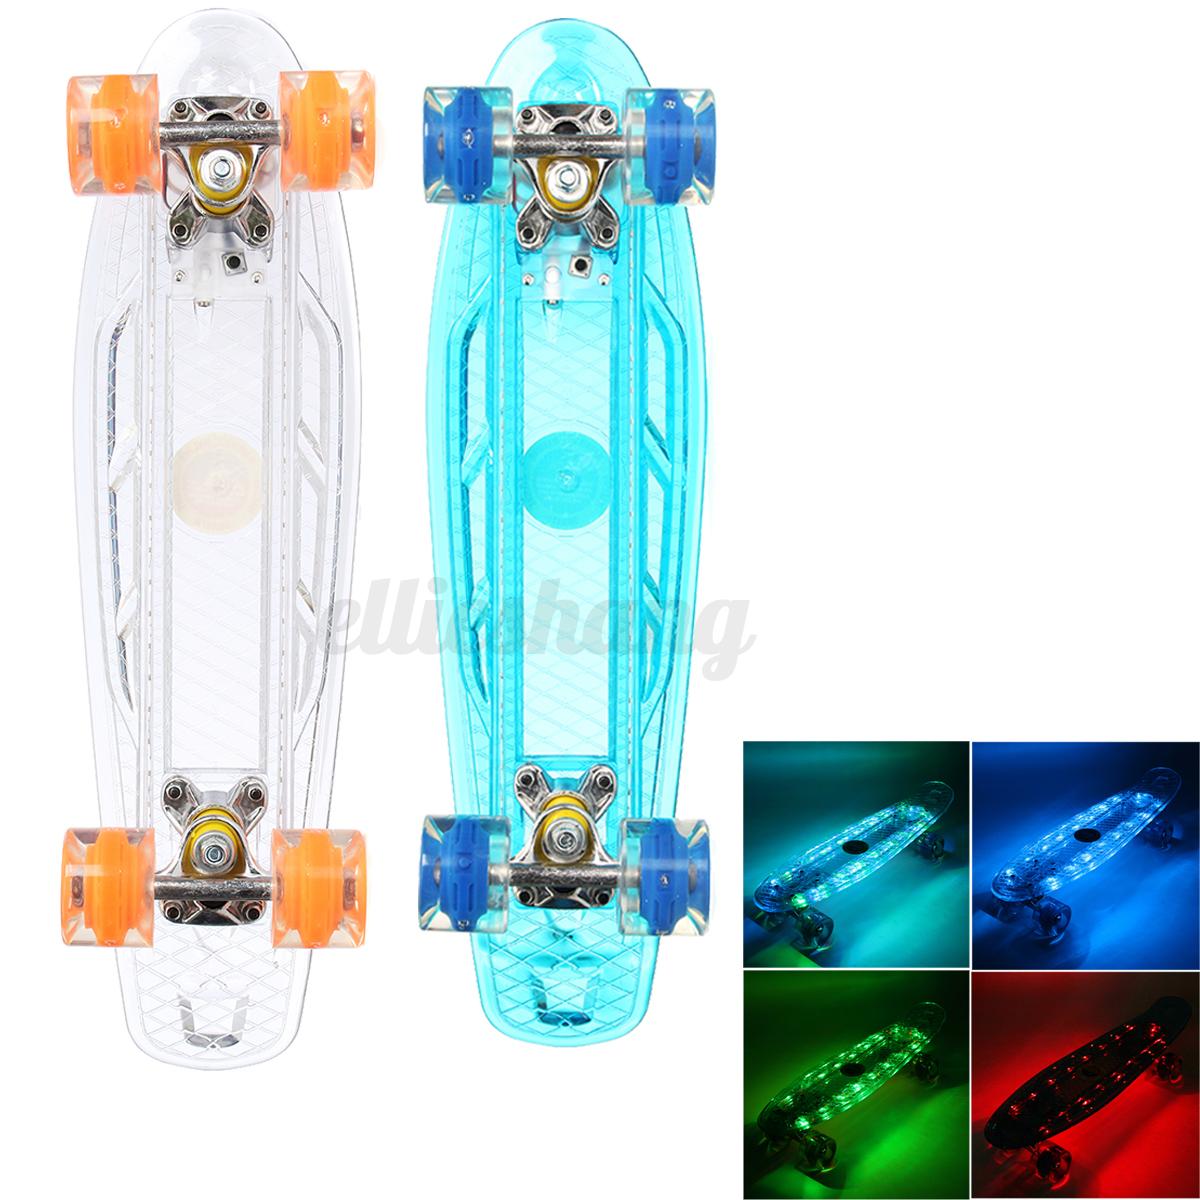 22'' LED Skateboard Longboard Flash di Luce Per Adulti e Bambini Quattro Ruote